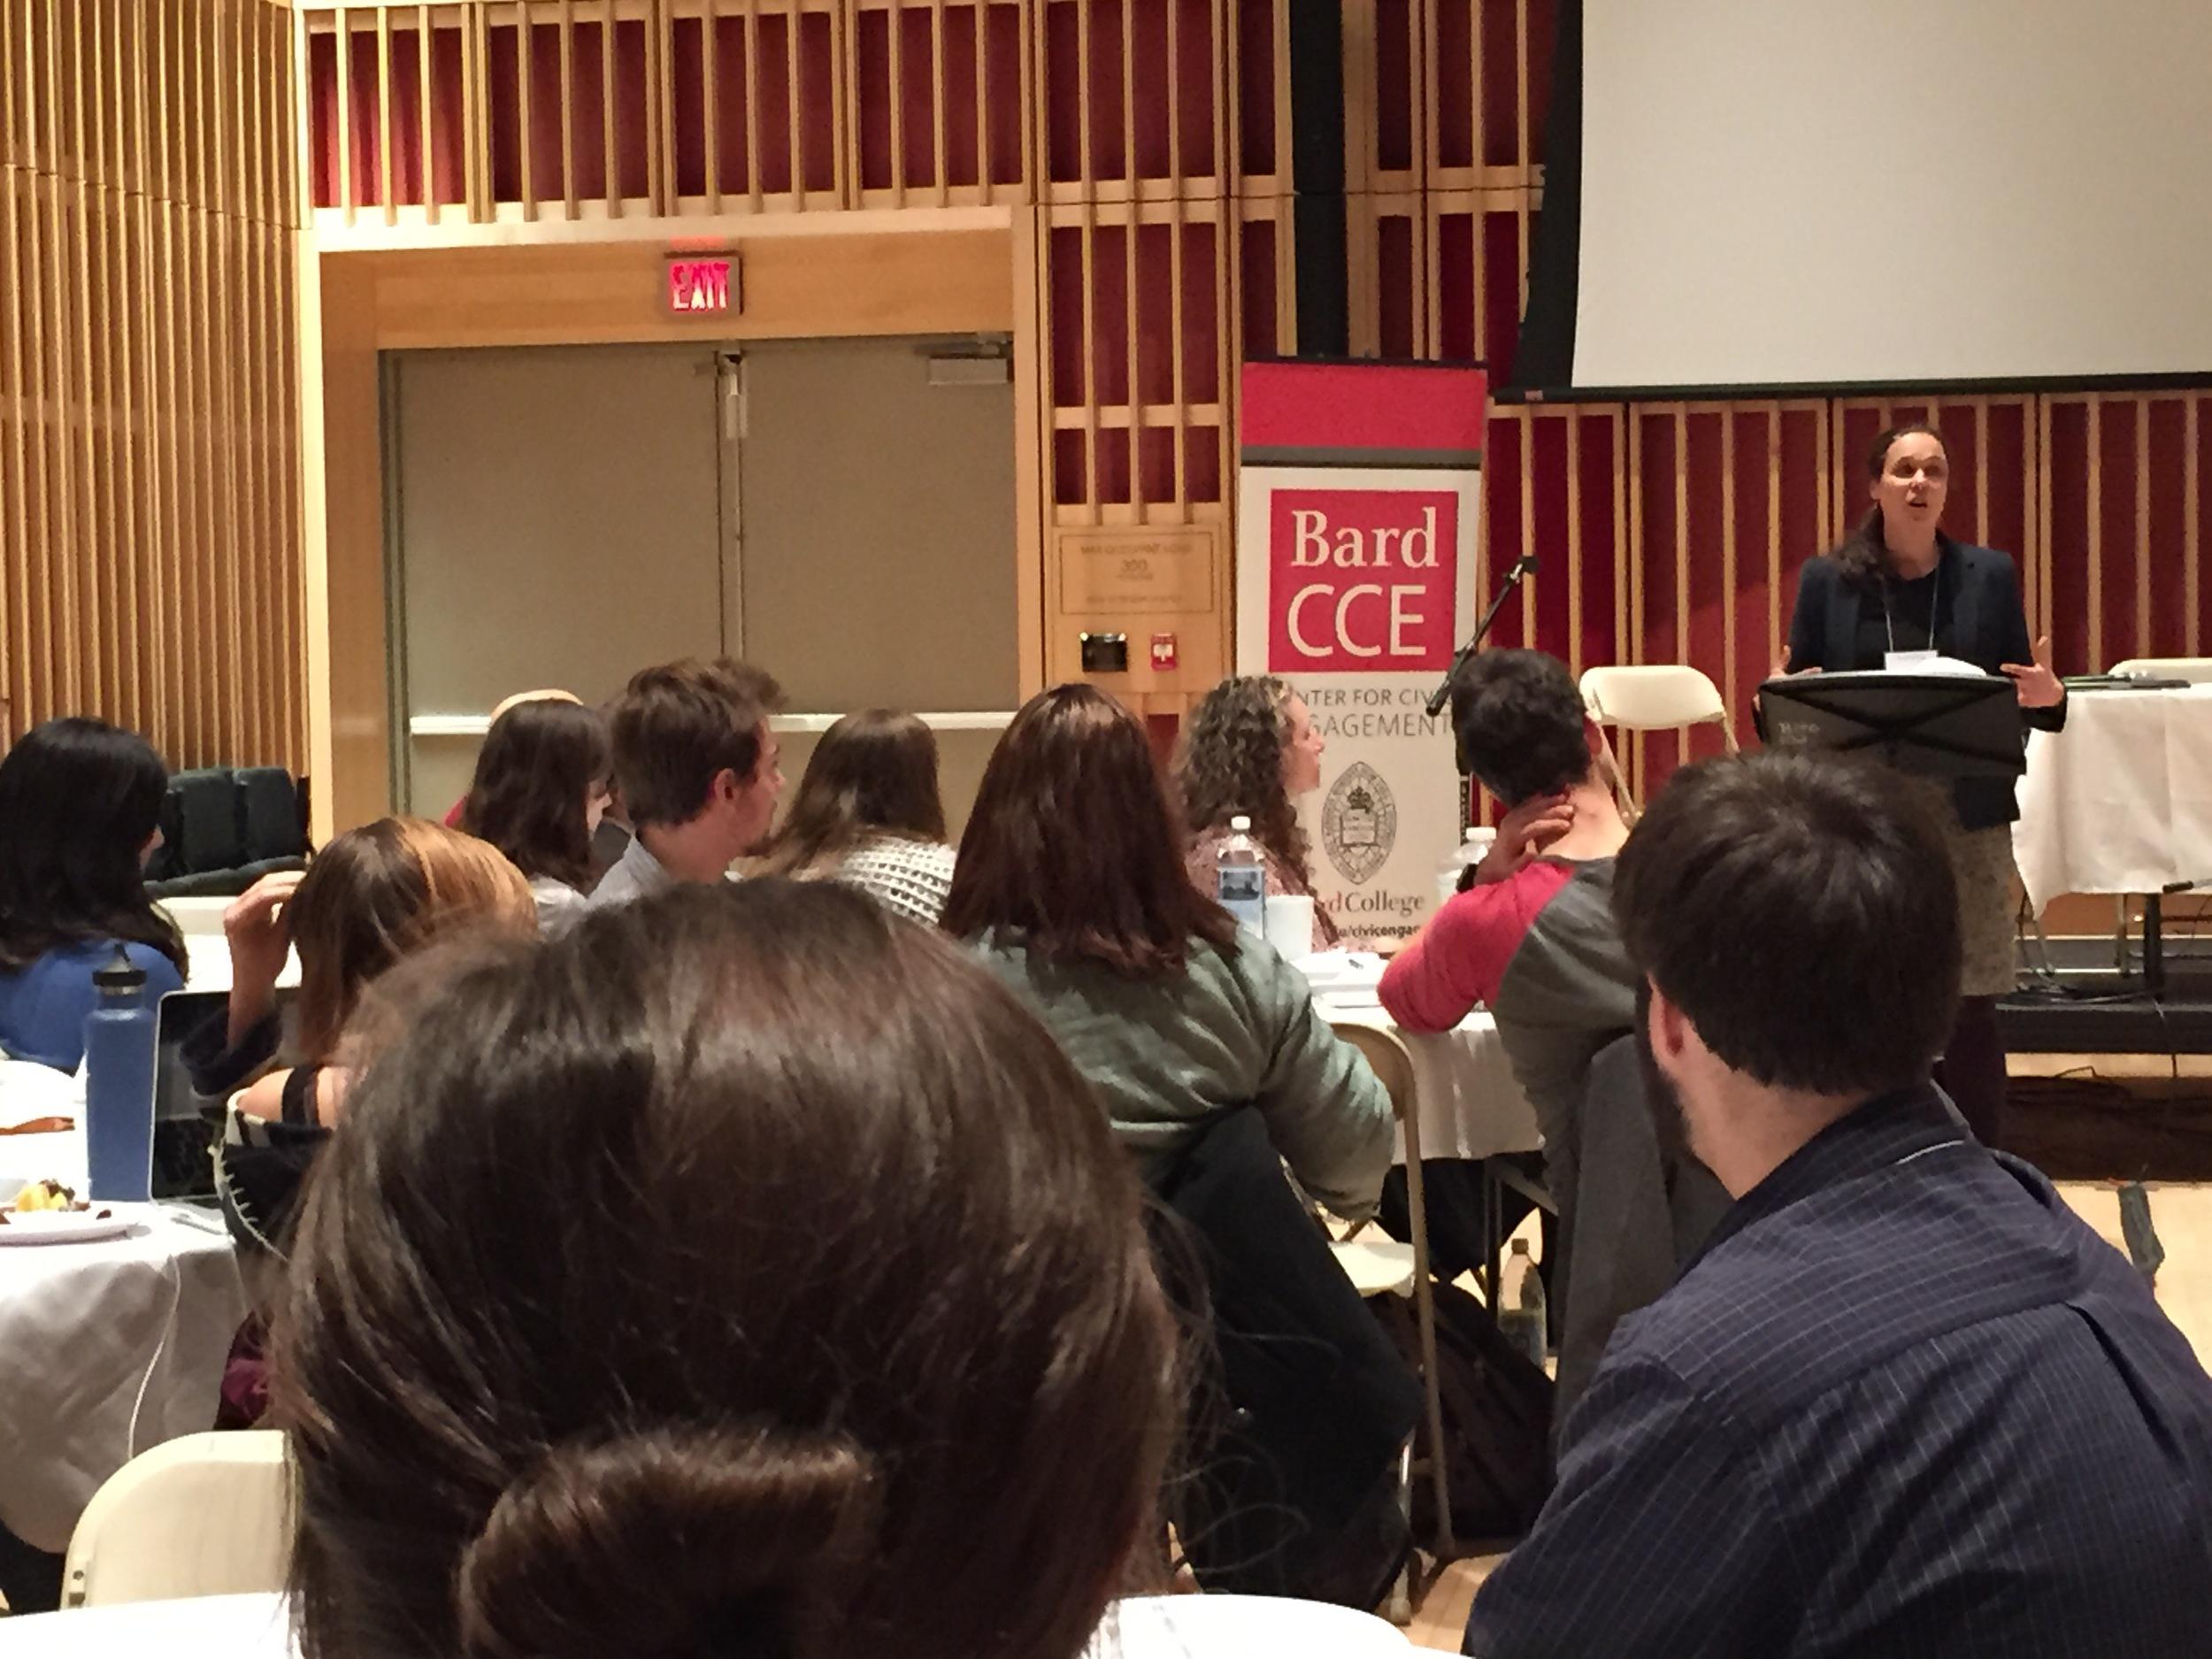 Val Nehez keynote speech at Bard College